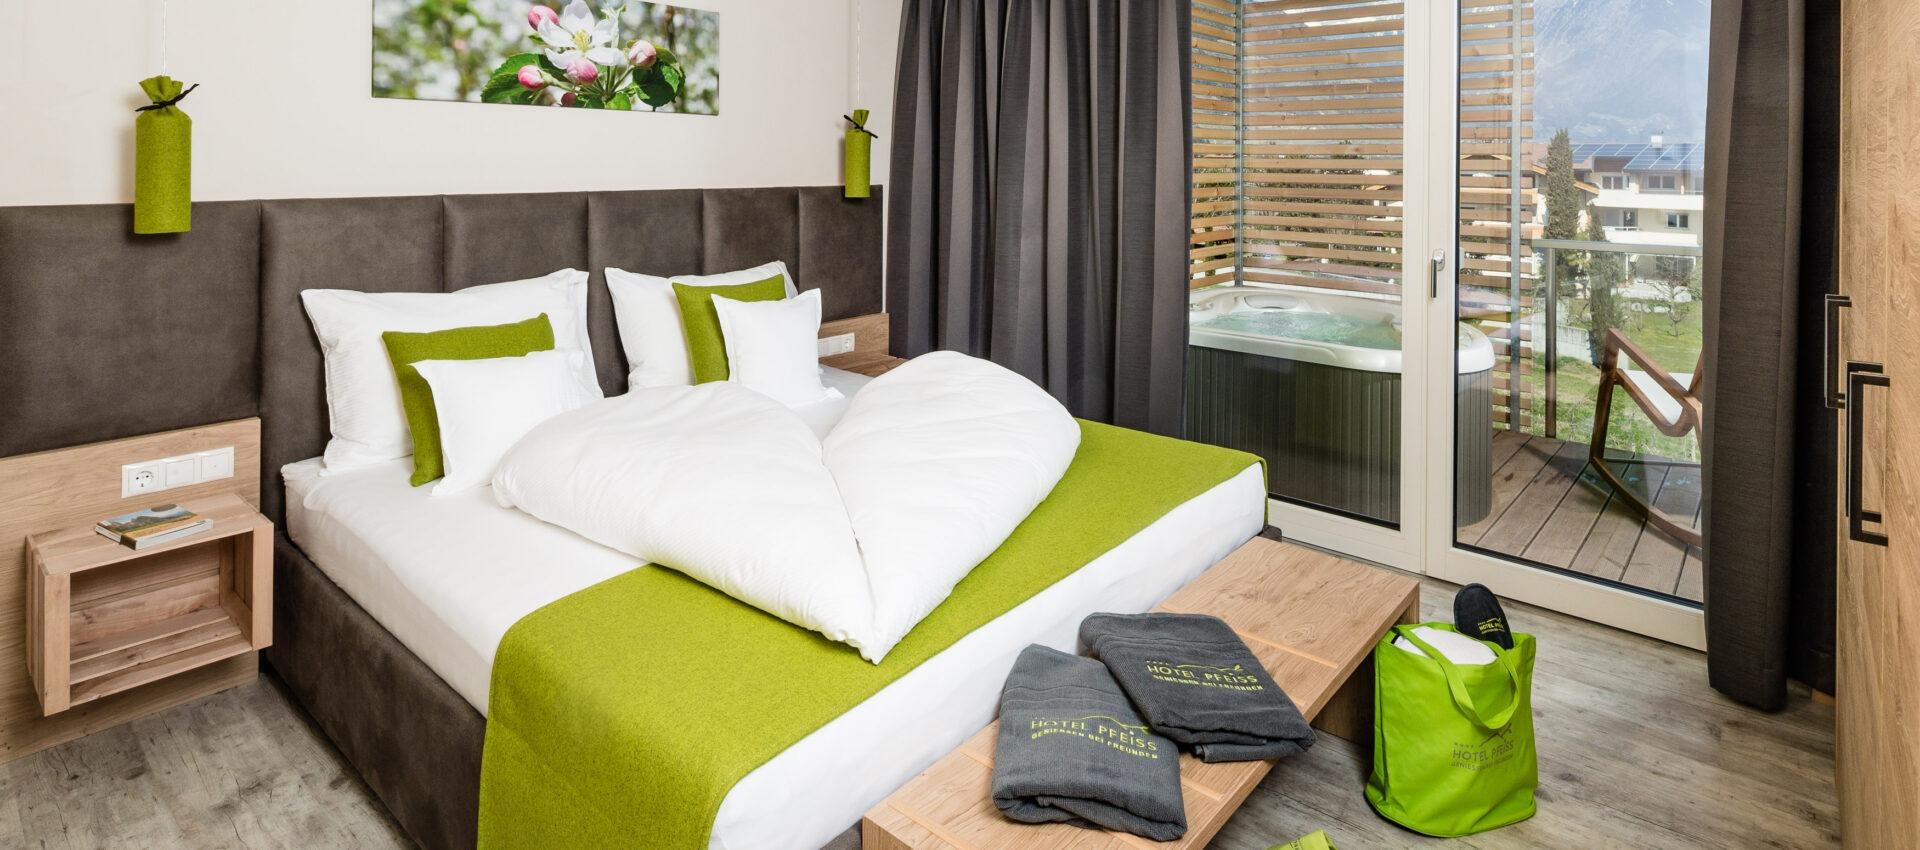 Zimmer Edelroat 4 Sterne Hotel in Lana Pfeiss - Meran - Südtirol